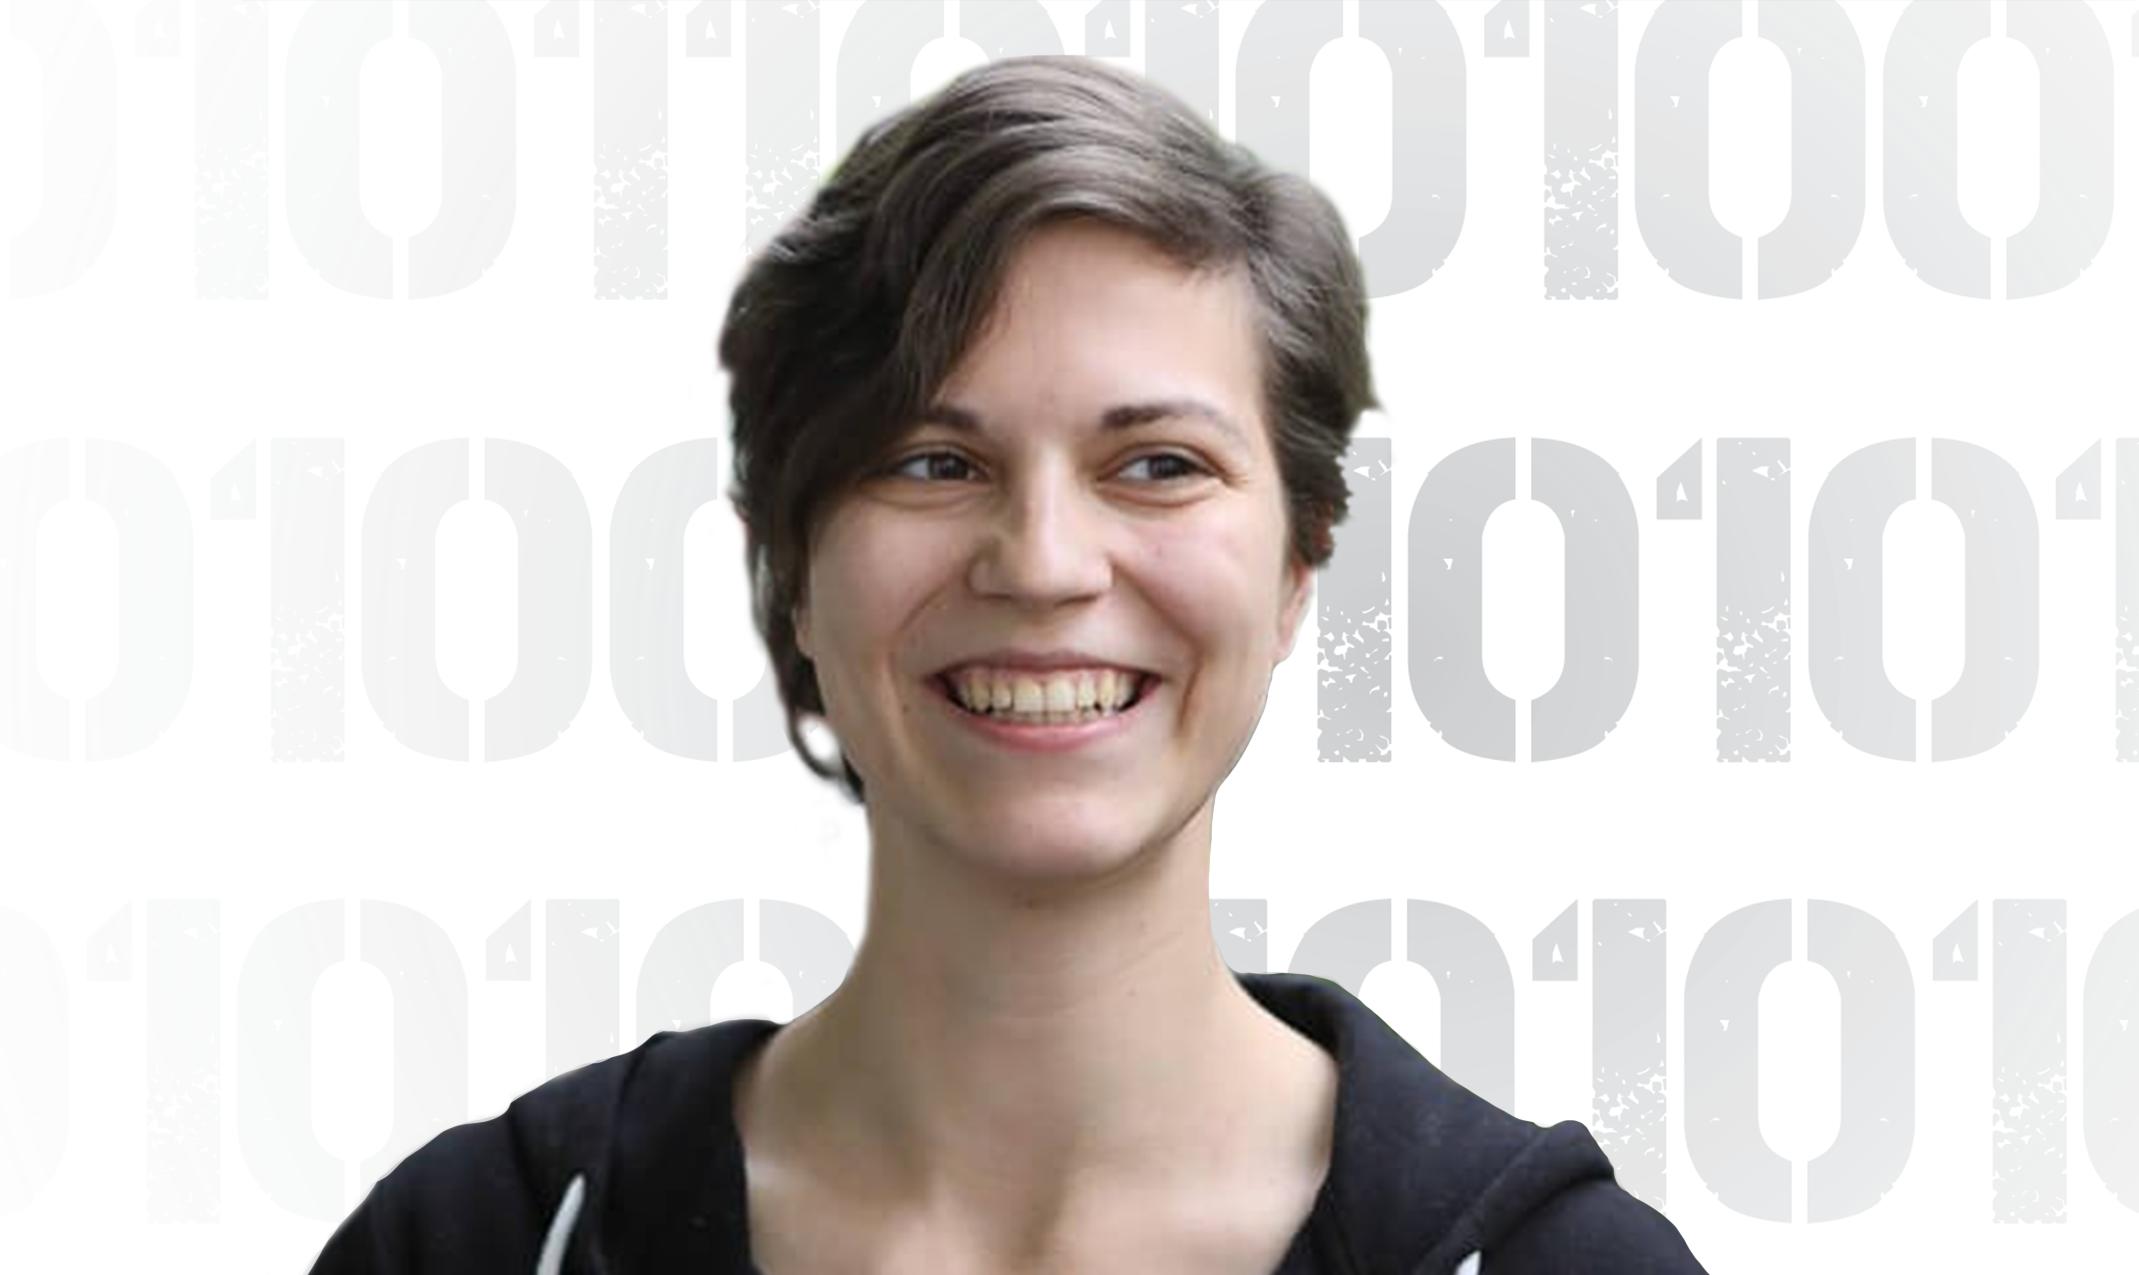 Lisa Duschek